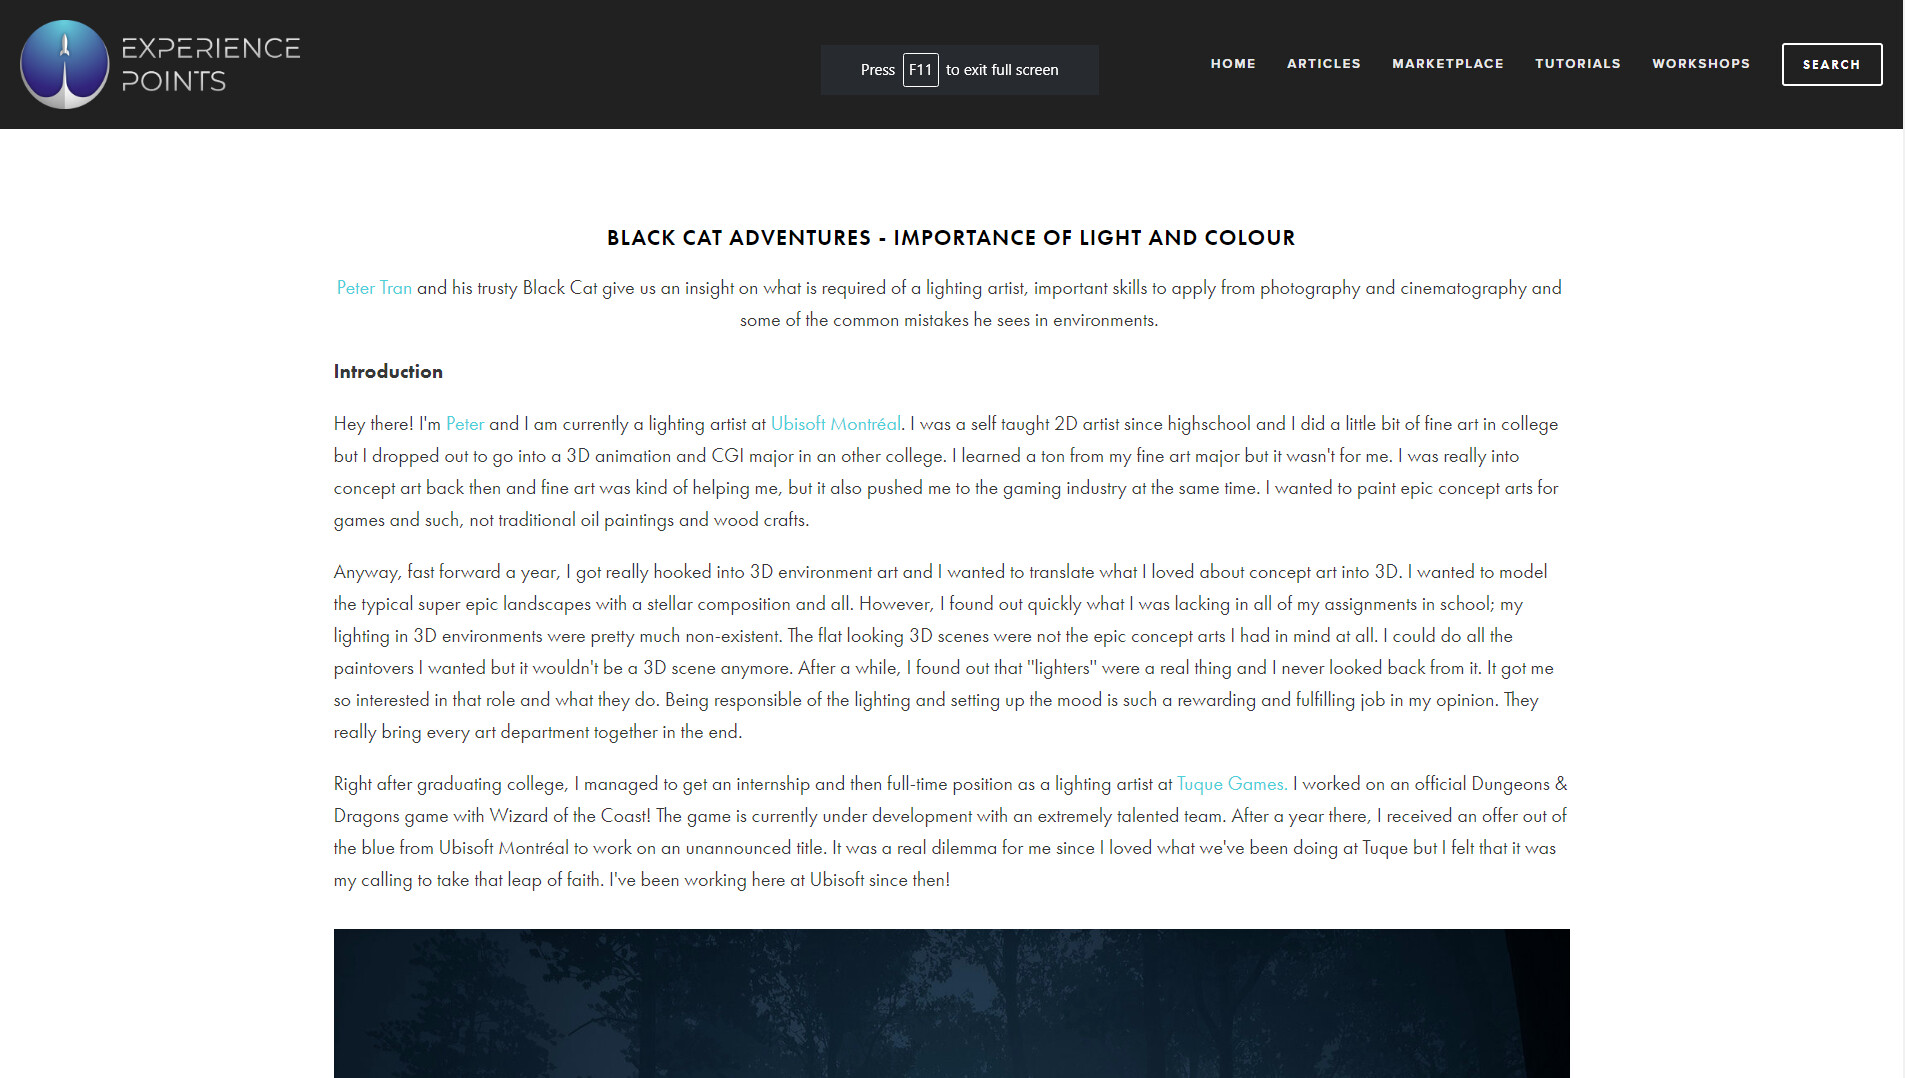 https://www.exp-points.com/black-cat-adventures-importance-of-light-and-colour